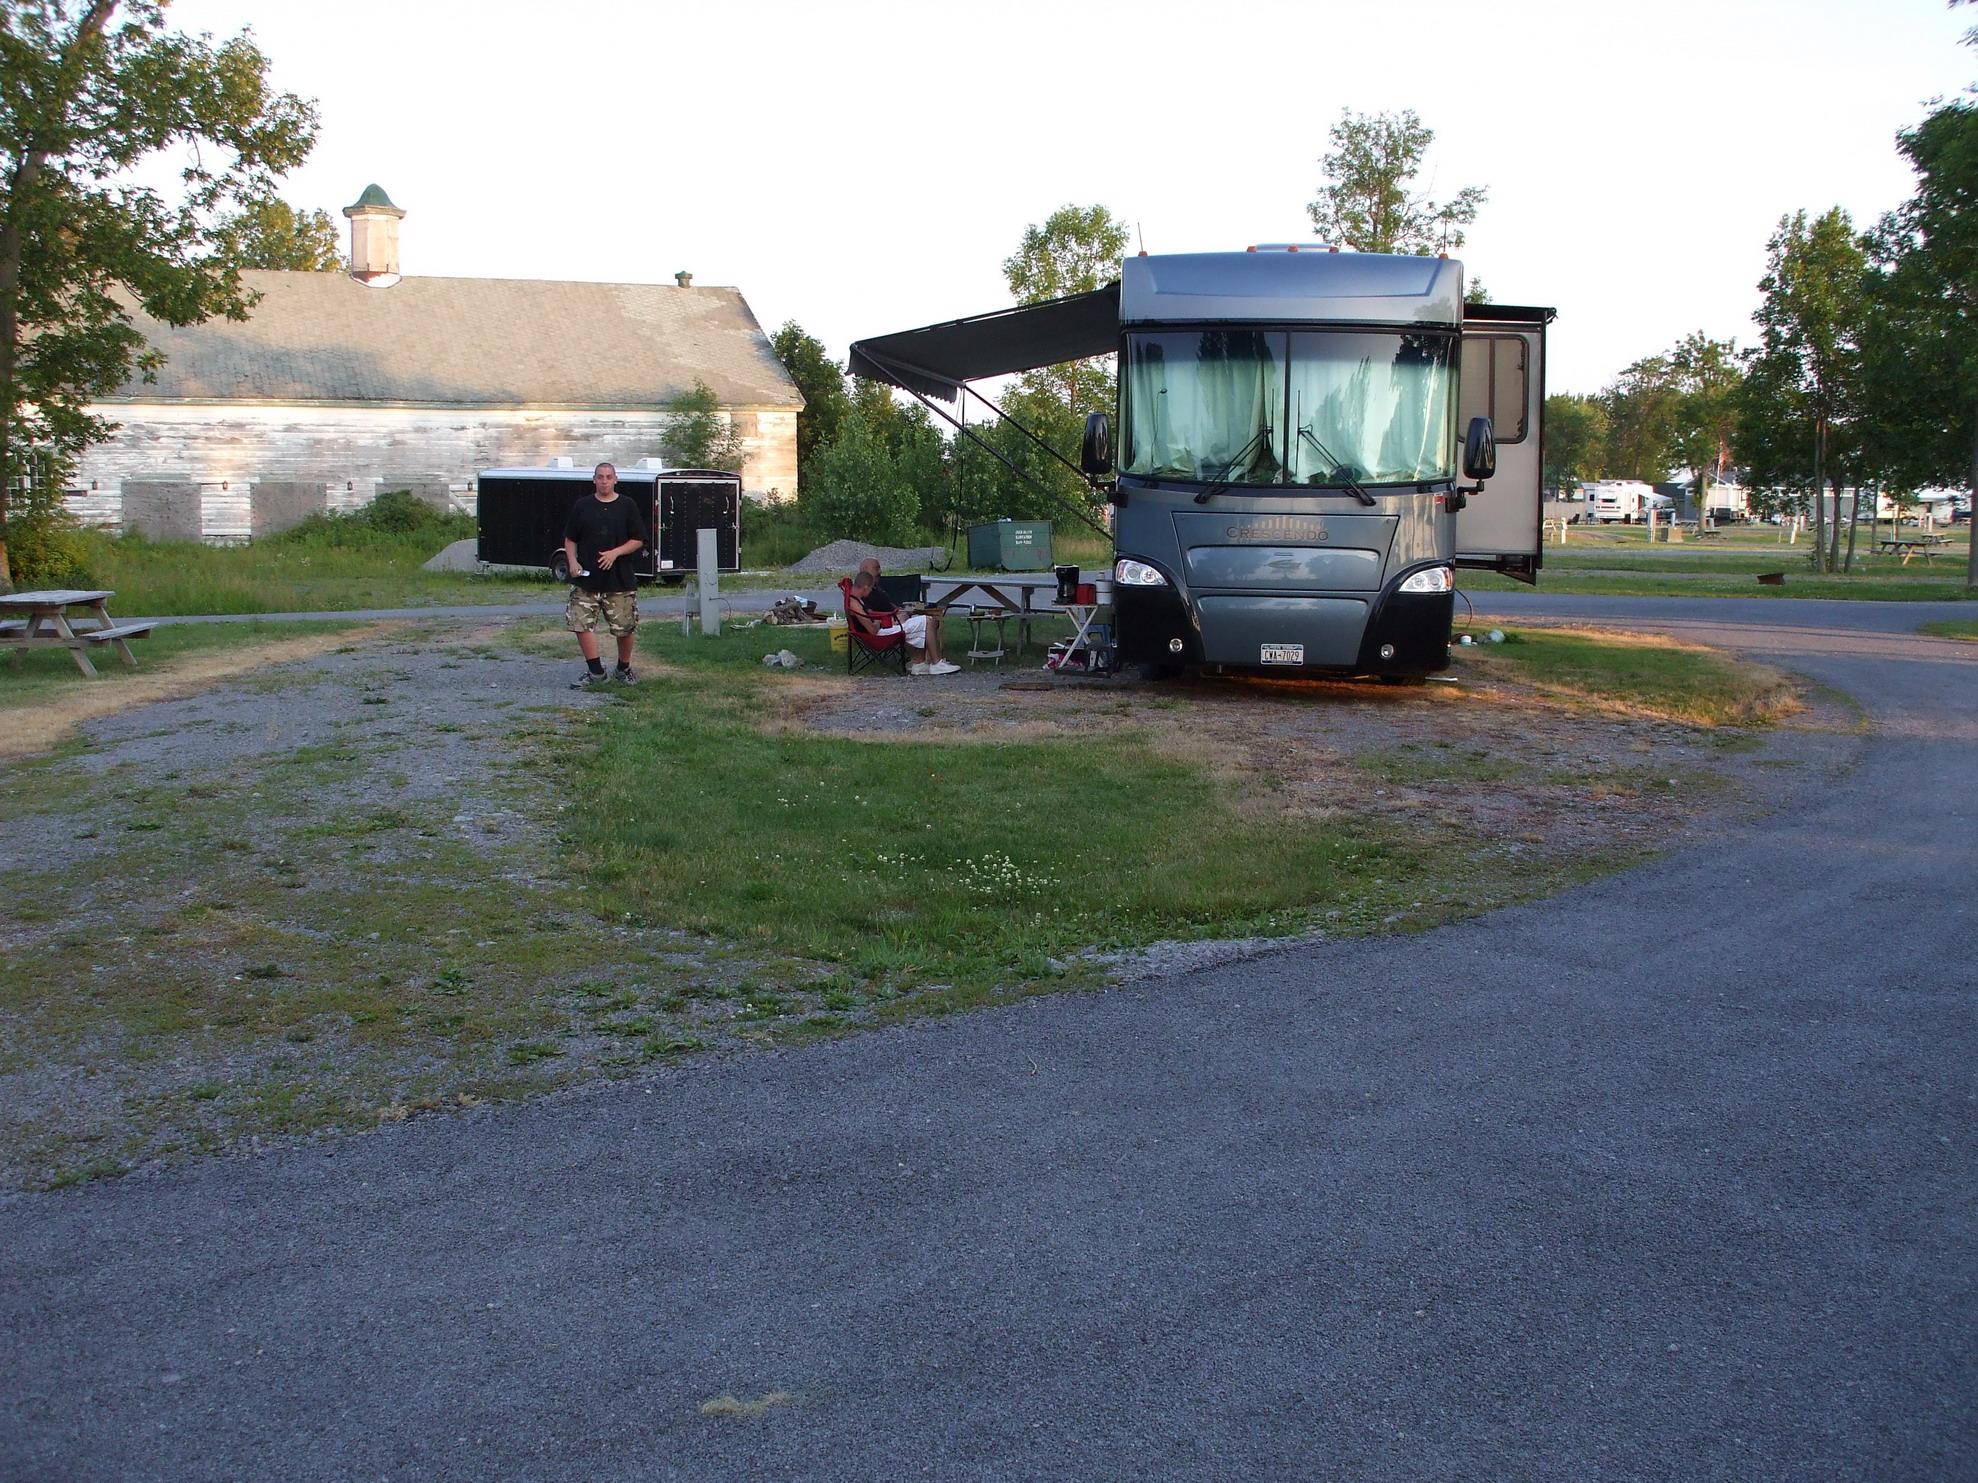 Associated Island RV Resort Lake View Site L28